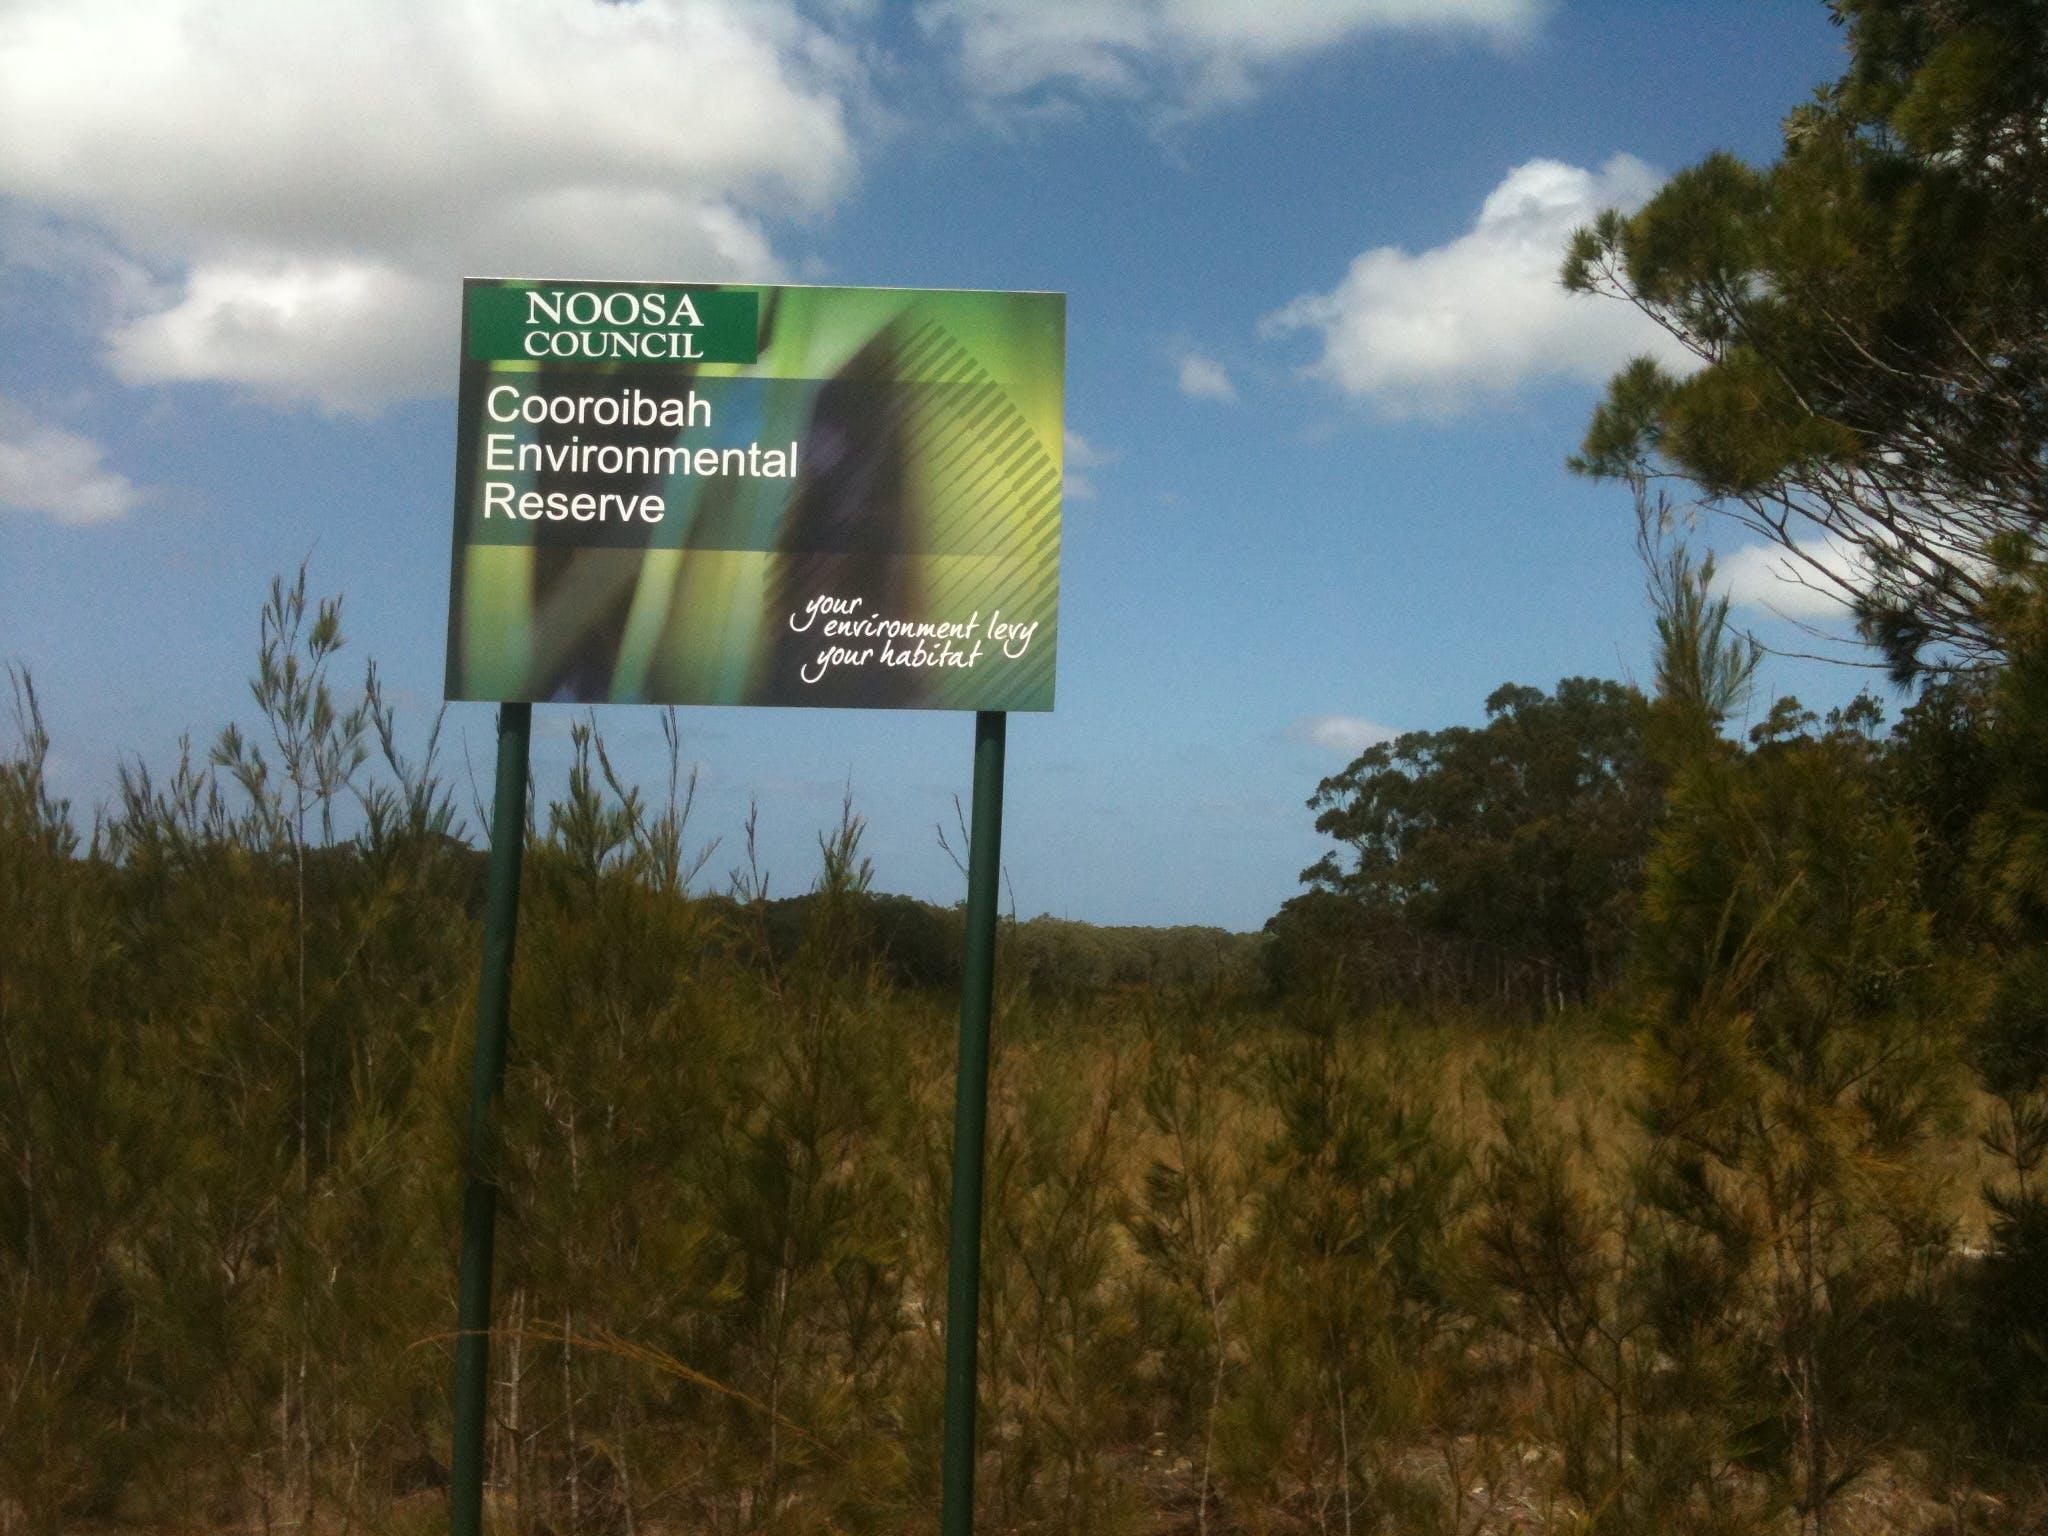 Cooiroibah Environmental Reserve